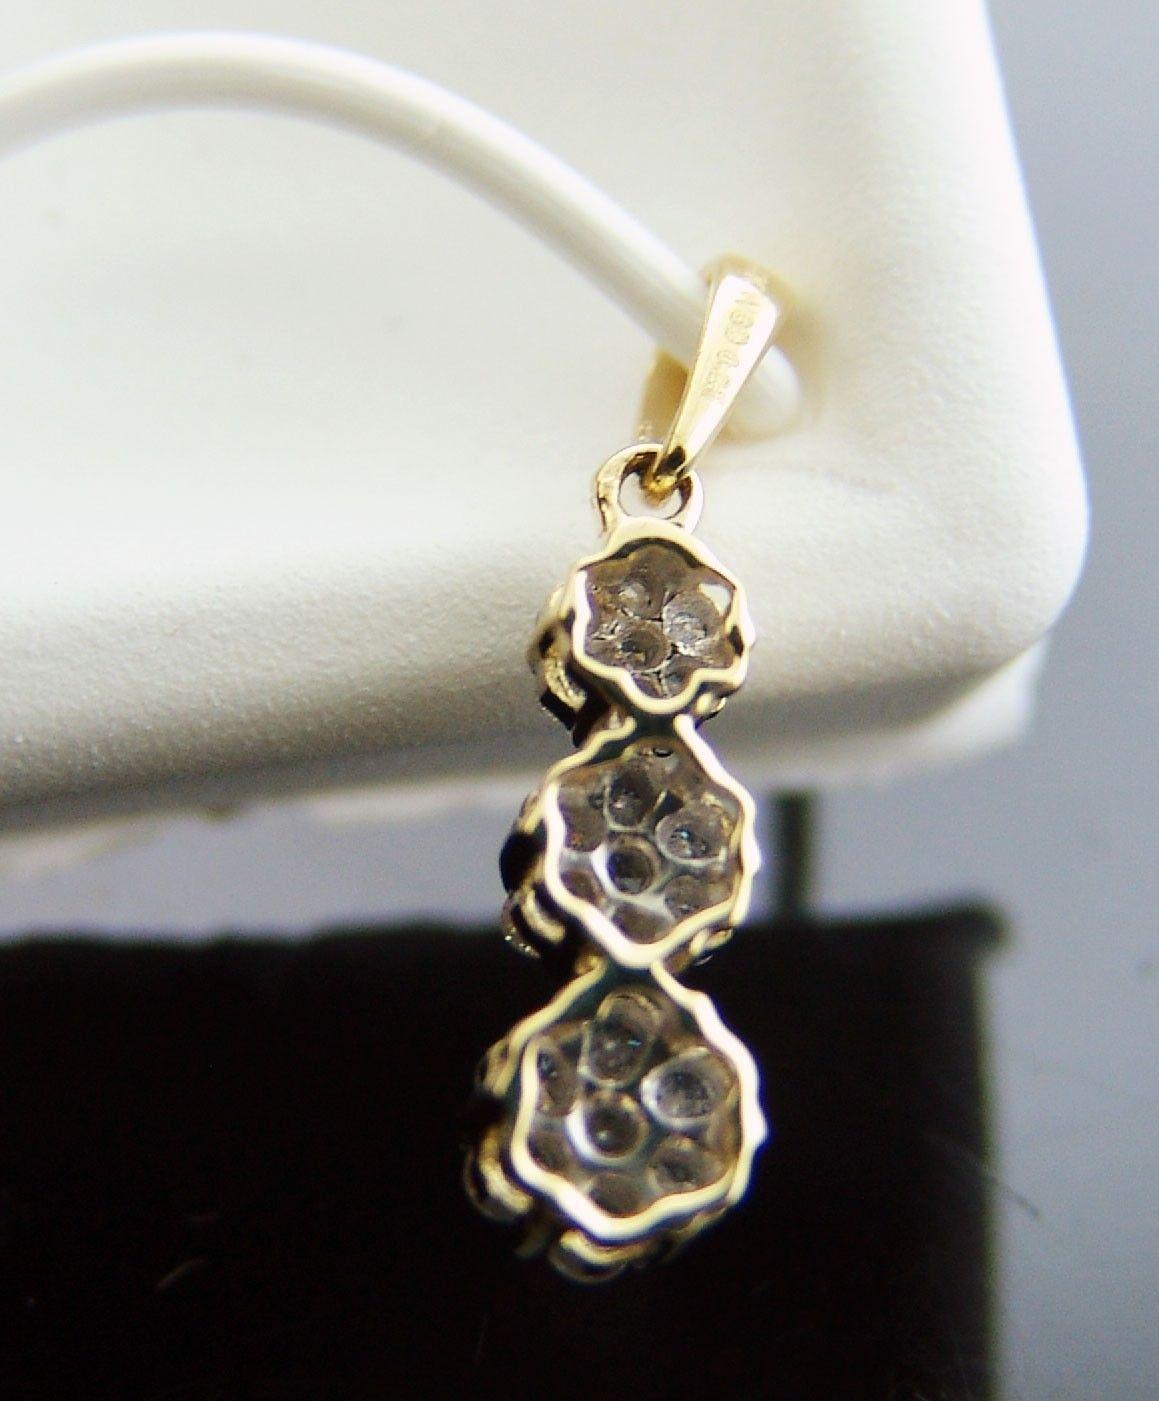 14K Gold Journey Pendant necklace 0.25 CT Diamond 21mm size long